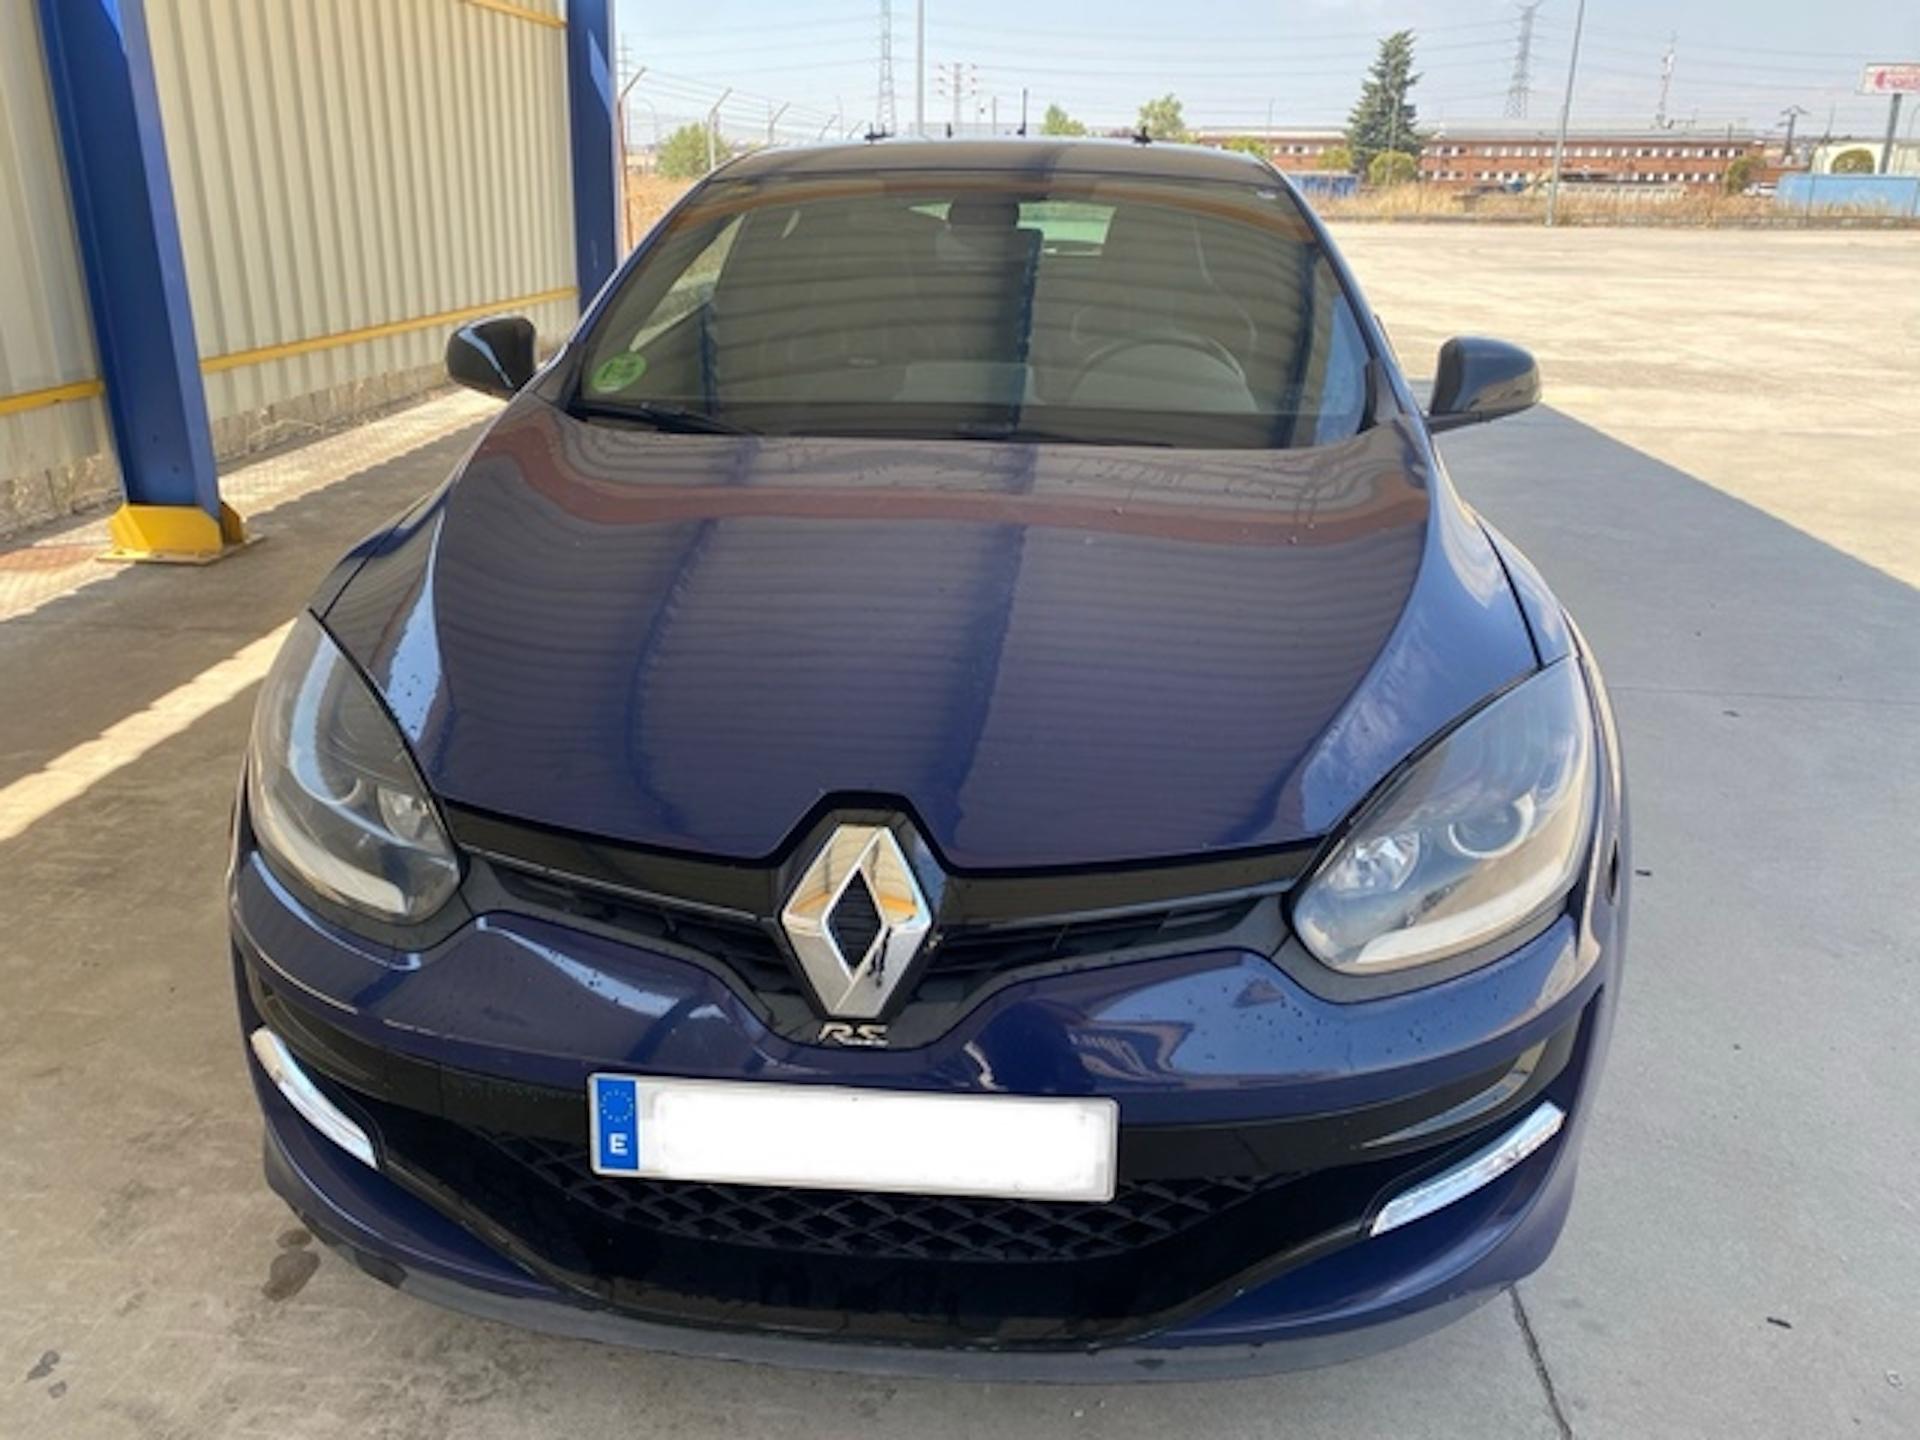 Renault Megane R S Policia Municipal Madrid Venta 3